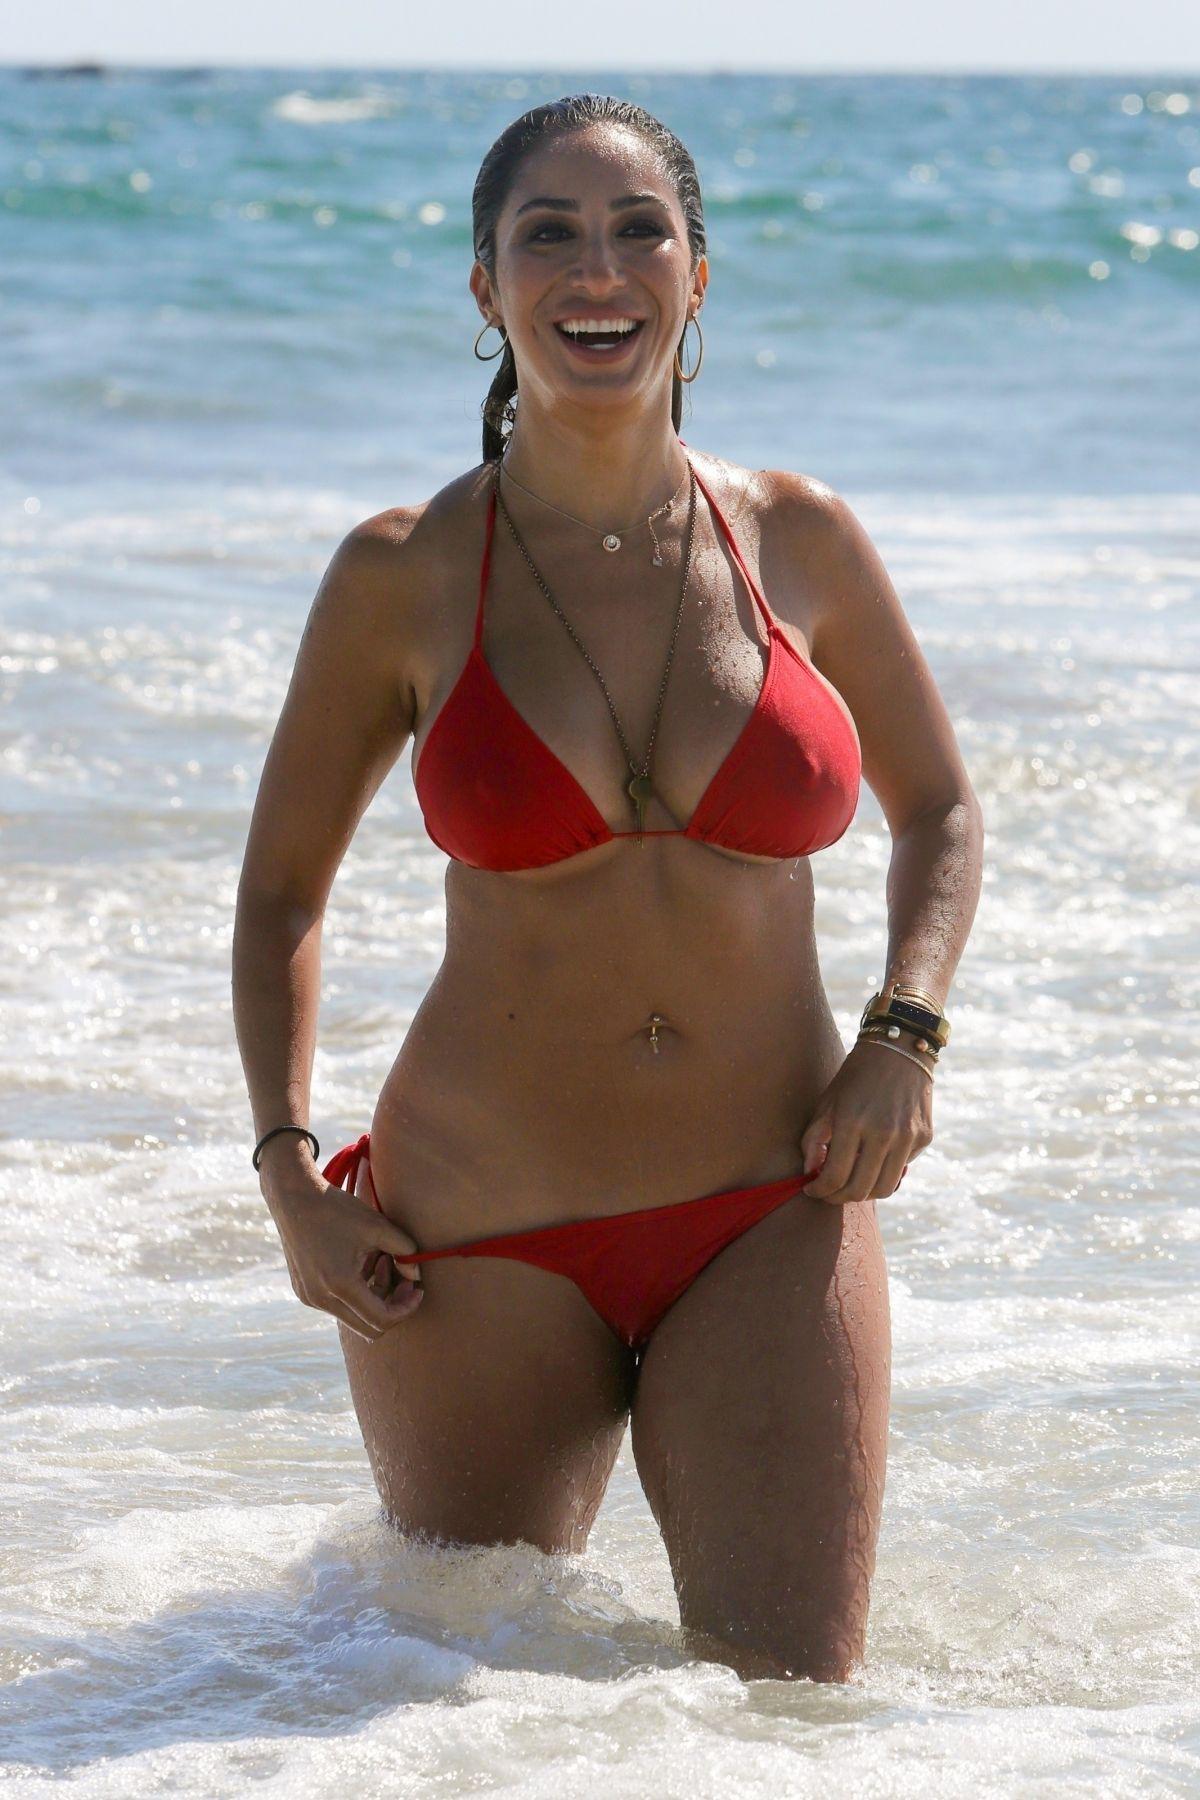 Swimsuit Liana Mendoza nudes (59 fotos) Topless, Twitter, swimsuit